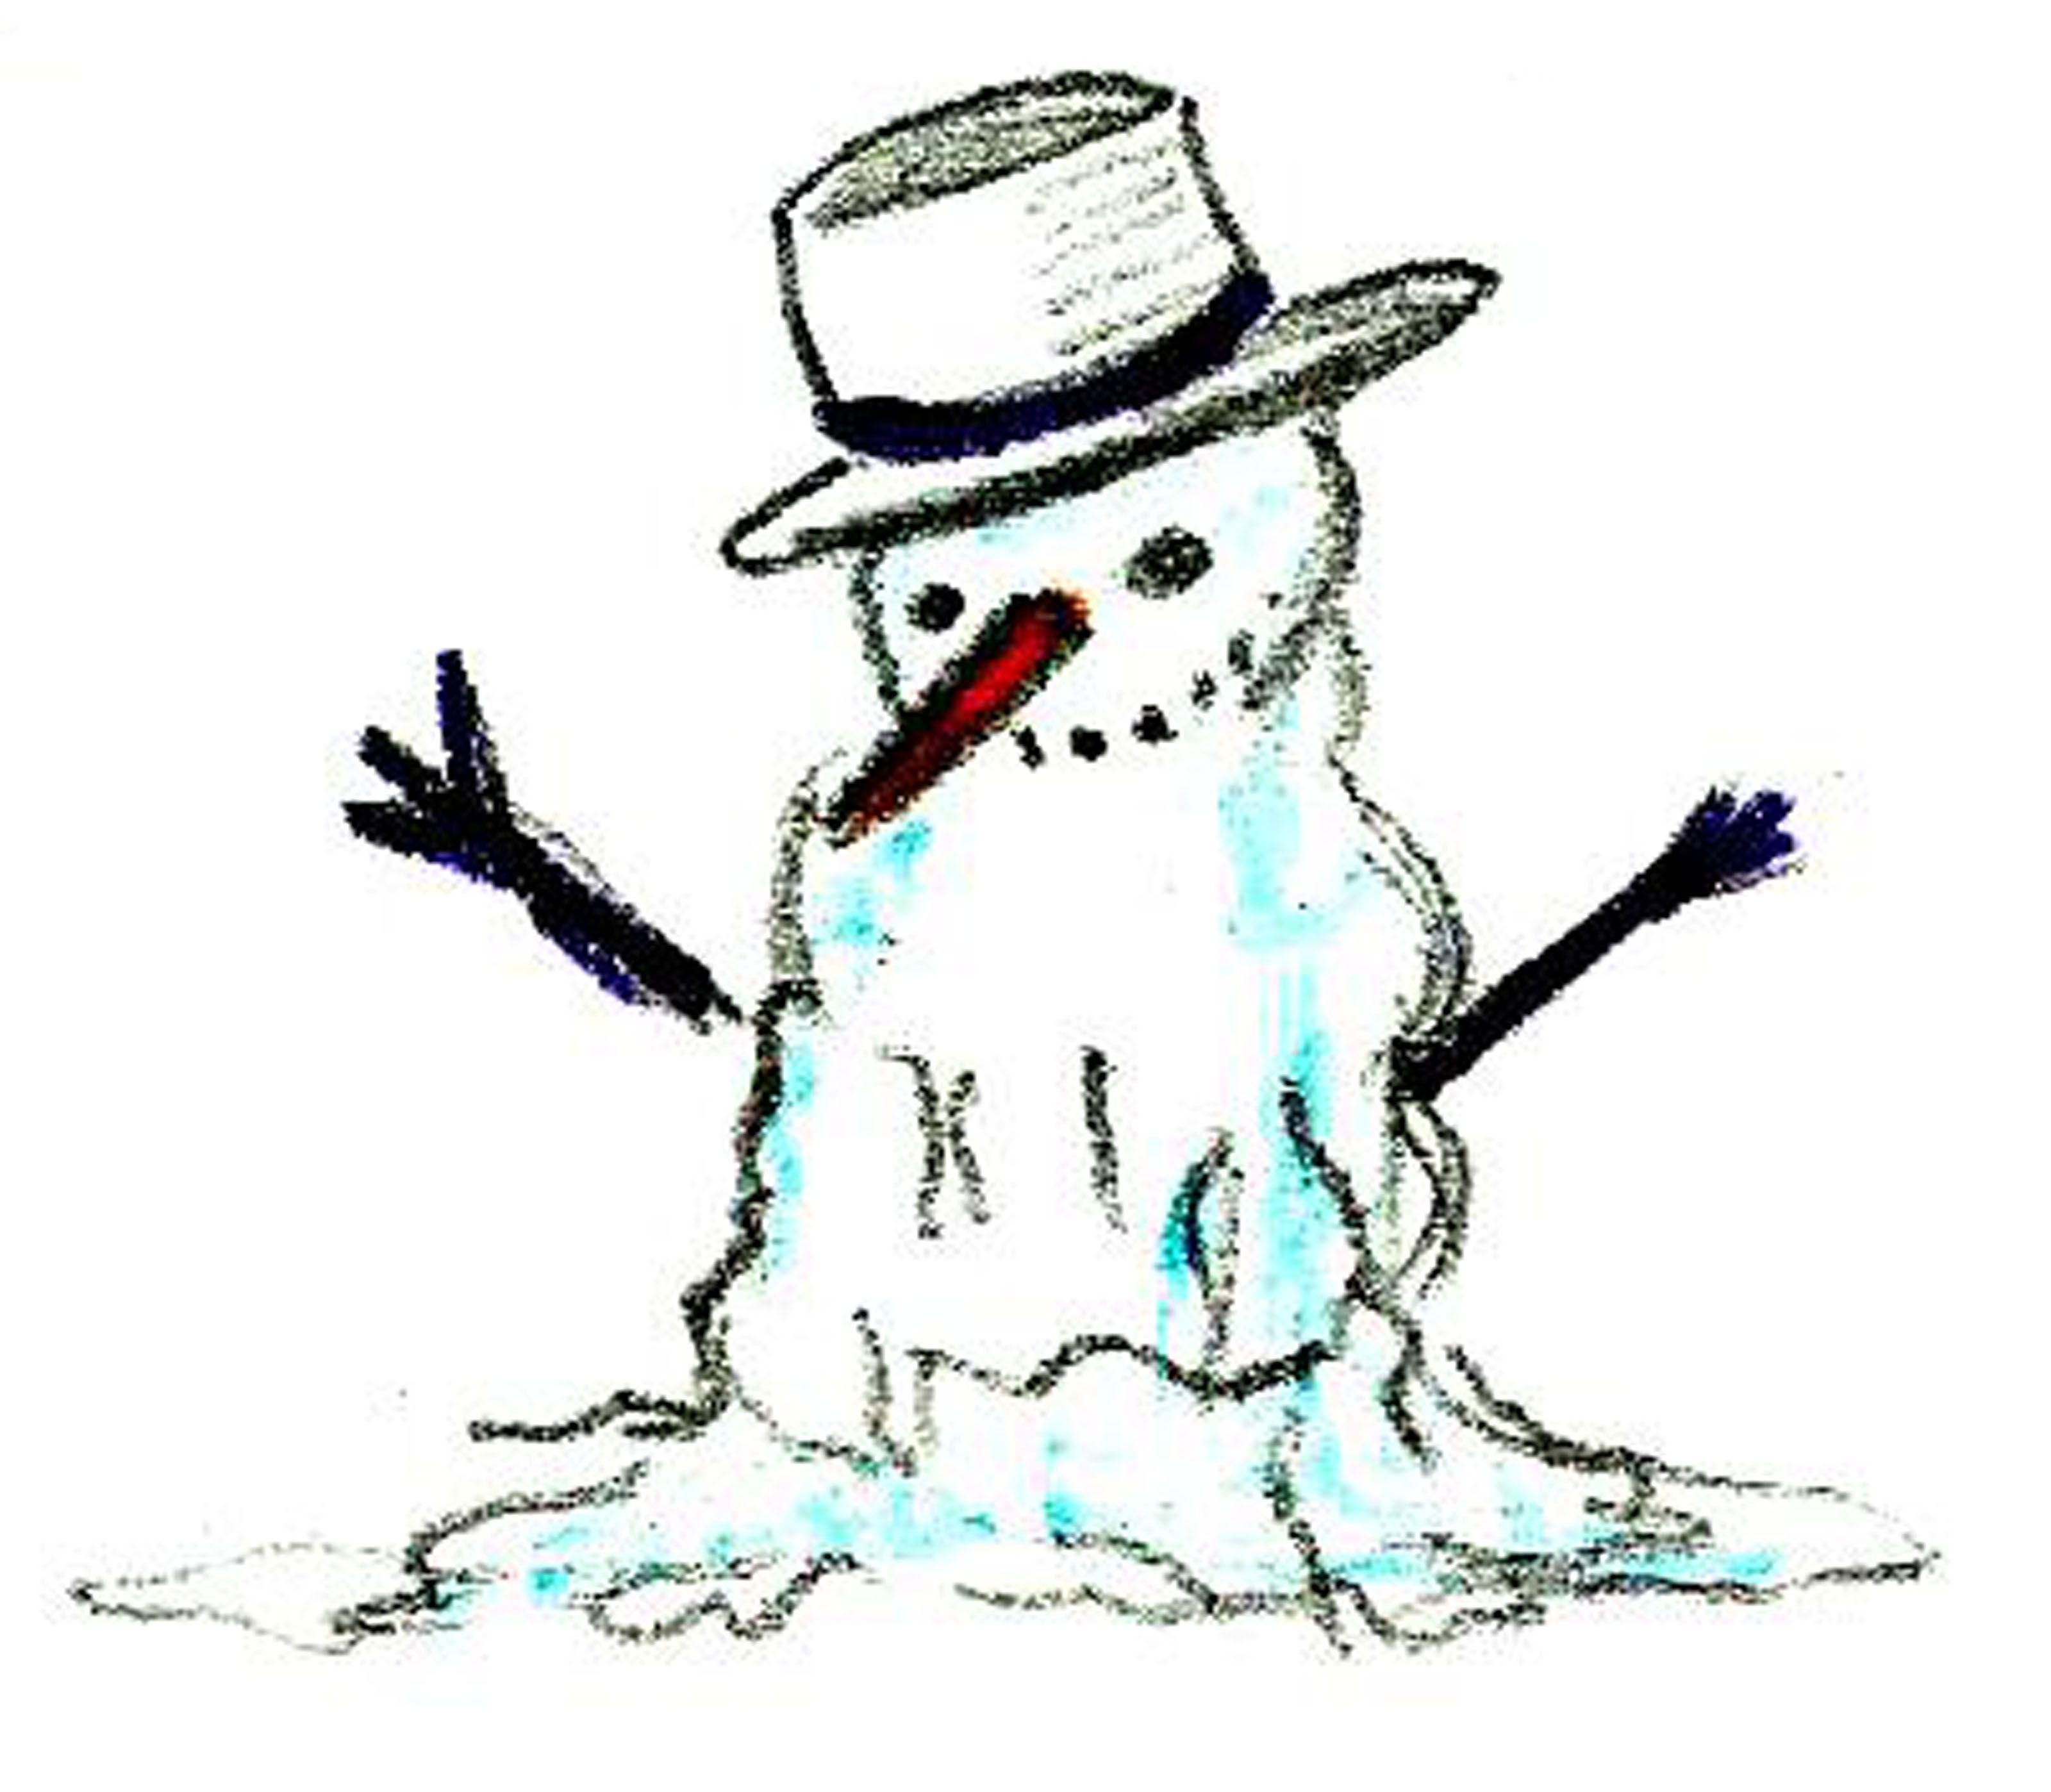 Melted snowman clipart jpg stock Melted snowman clipart free - ClipartFest | Crafts | Snowman clipart ... jpg stock